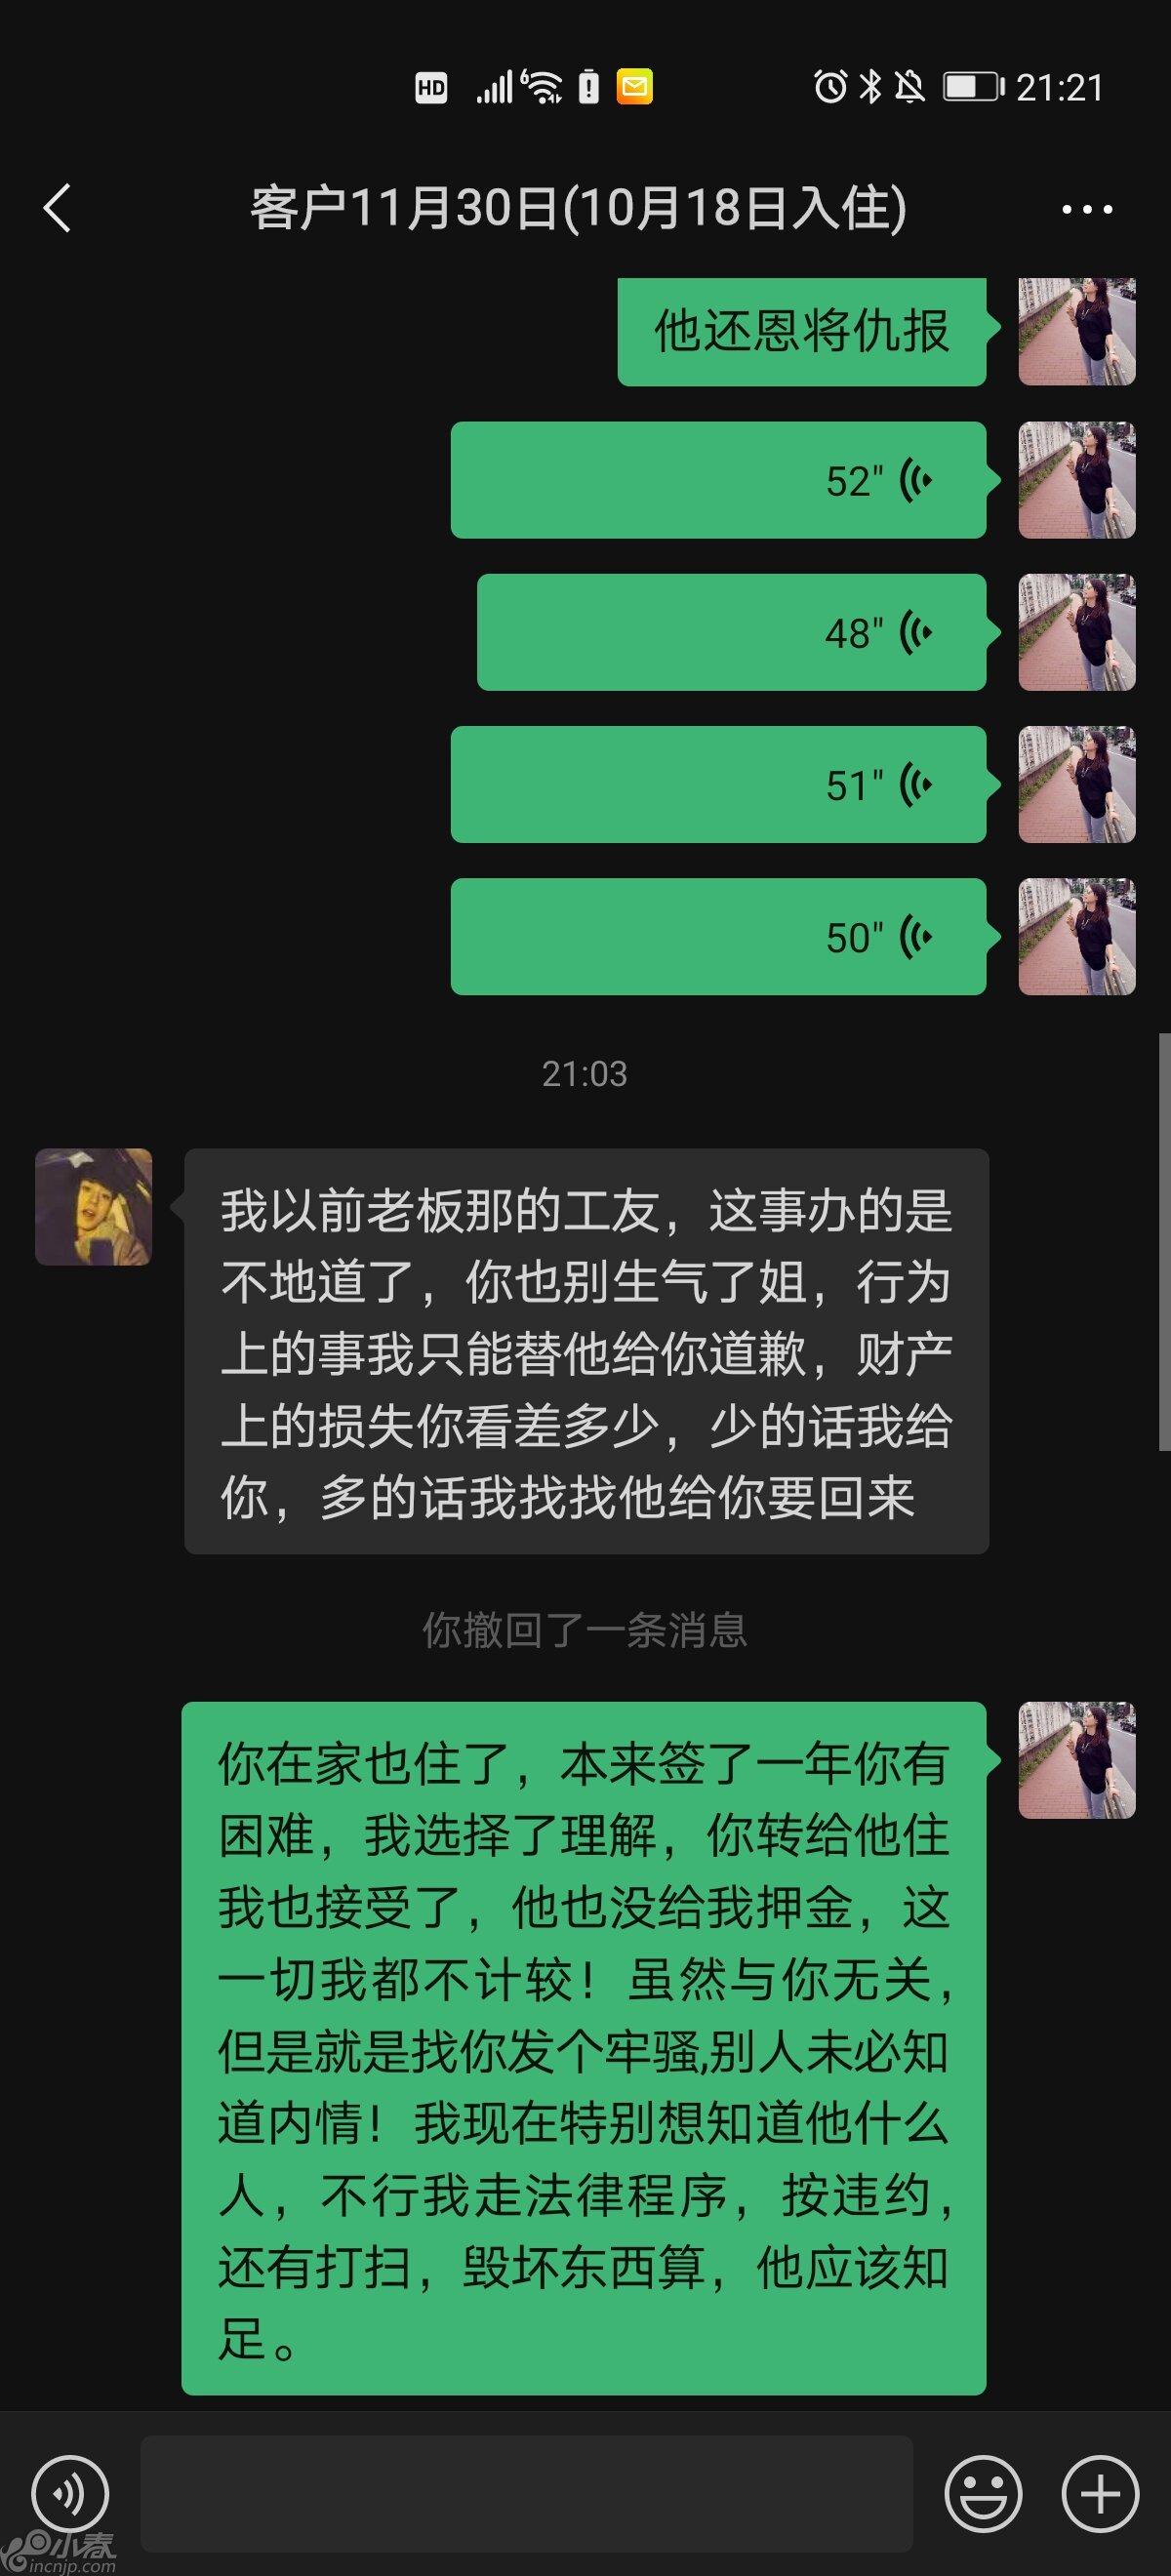 Screenshot_20210721_212111_com.tencent.mm.jpg